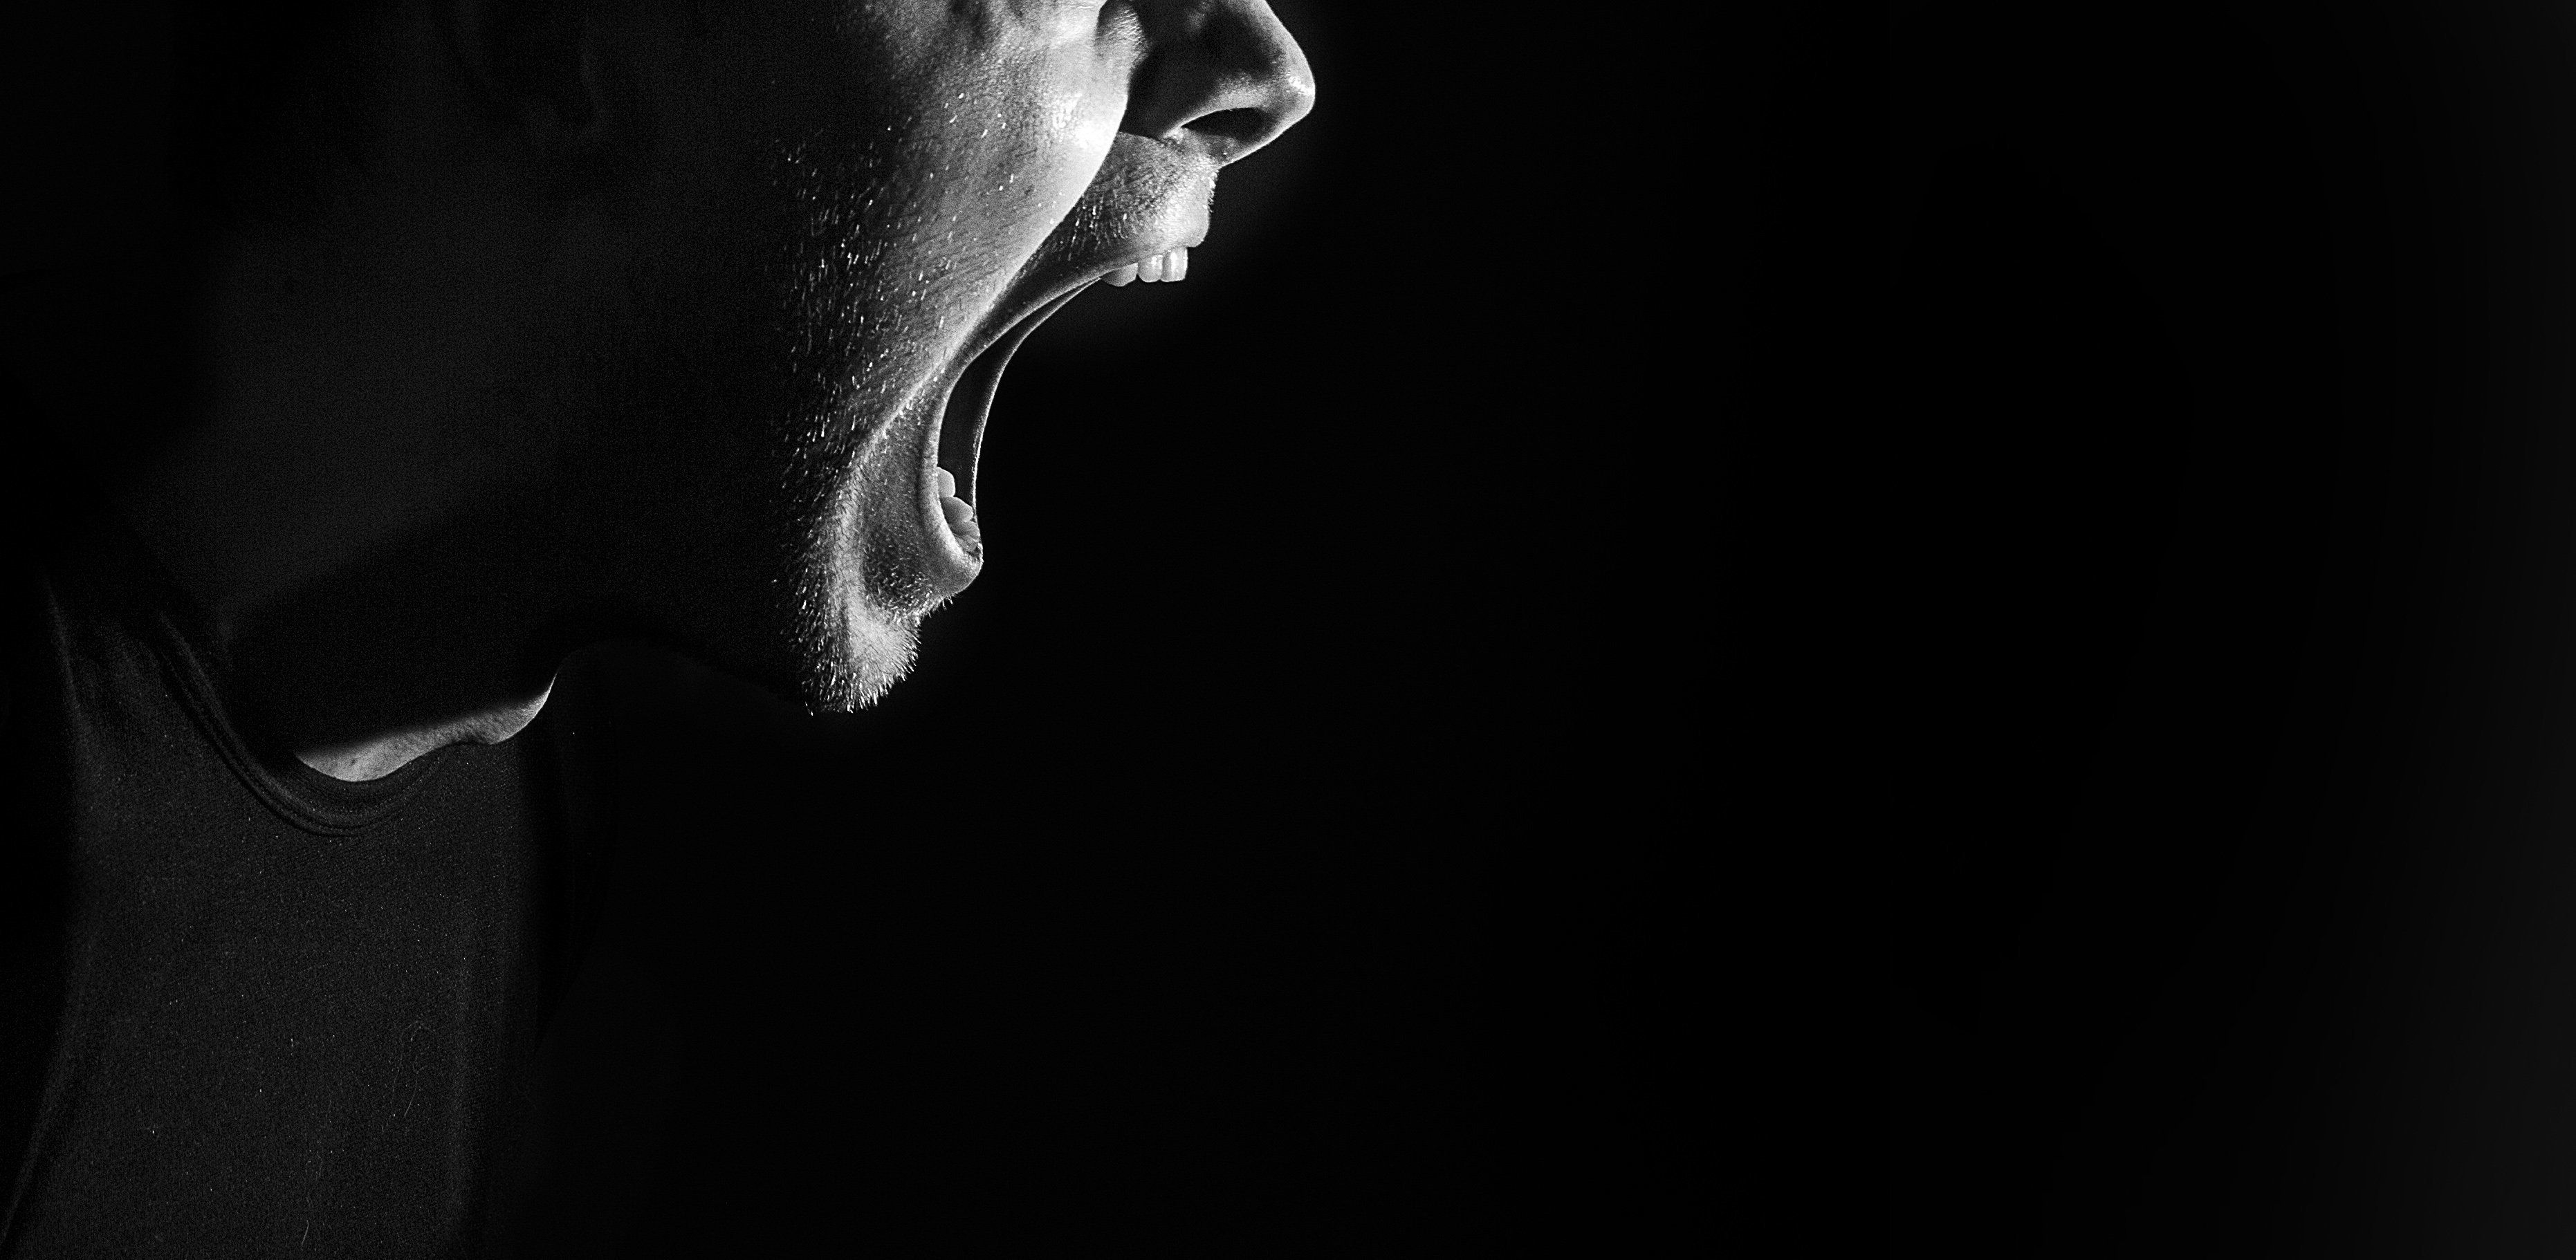 Incels: Μισογυνισμός και σεξισμός η ιδεολογία της κοινότητας που ενέπνευσε τον μακελάρη του